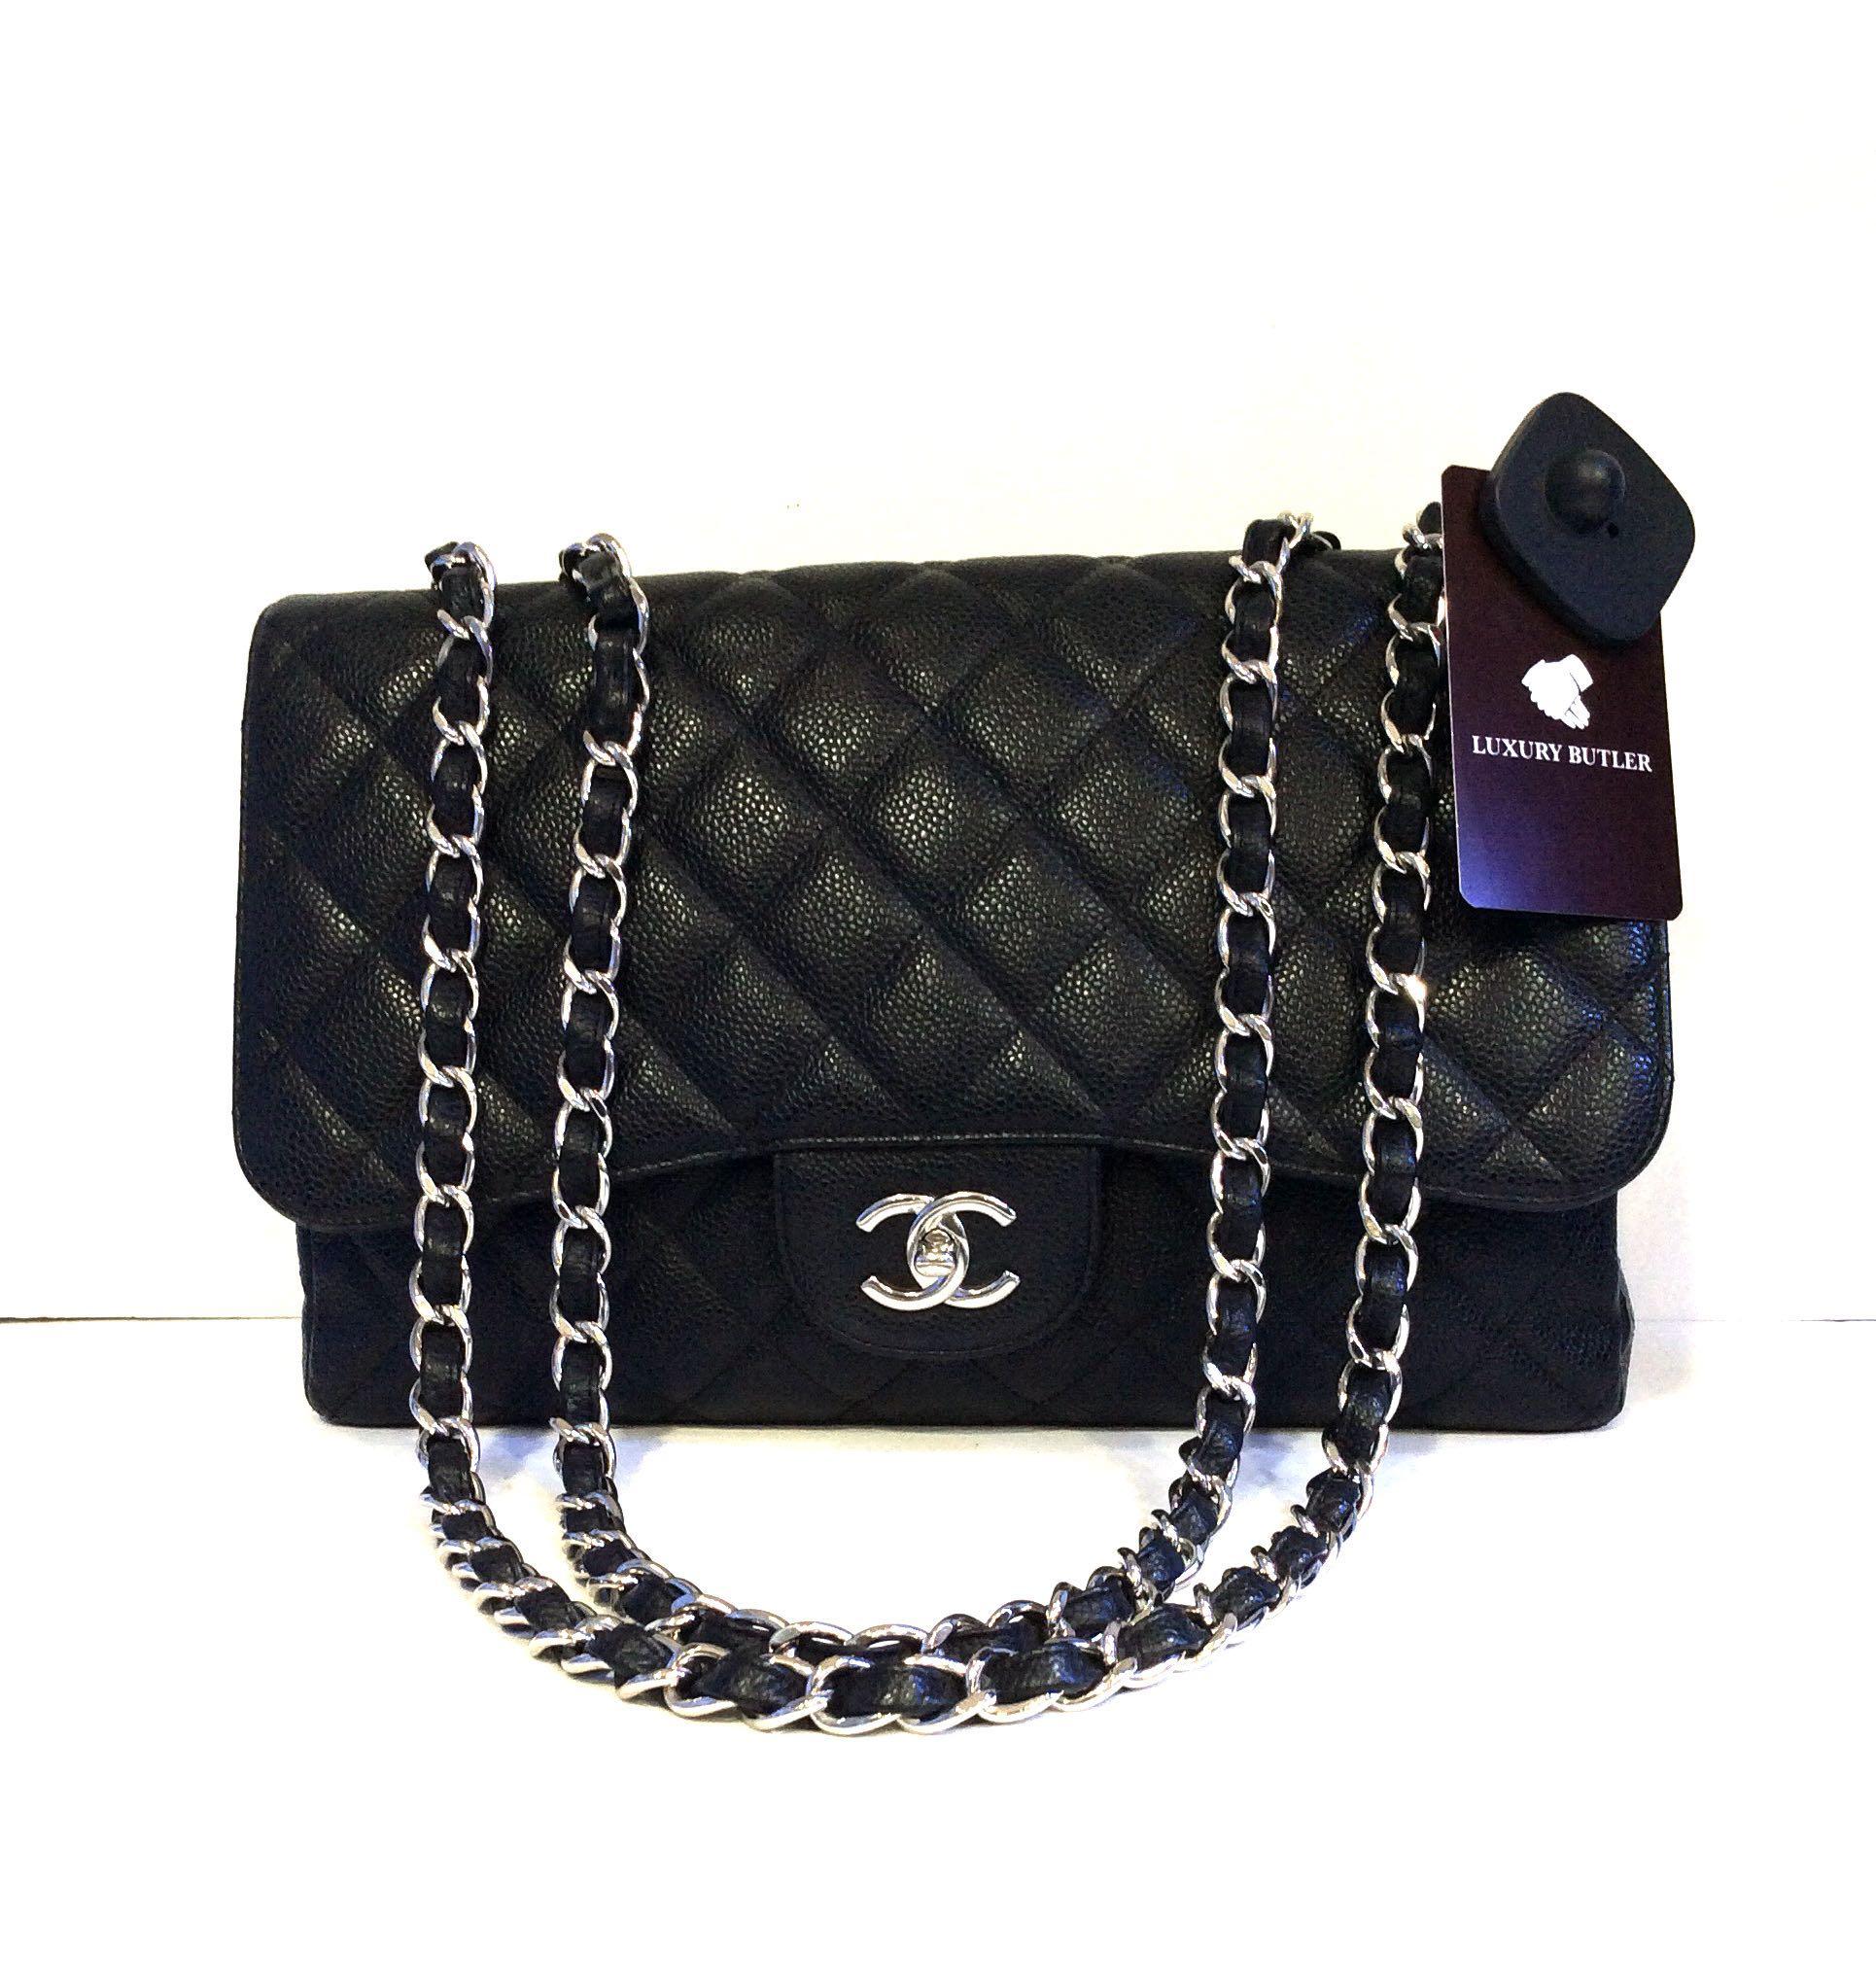 791799cf3483 Preloved Chanel Classic Flap Caviar Leather Bag, Women's Fashion ...